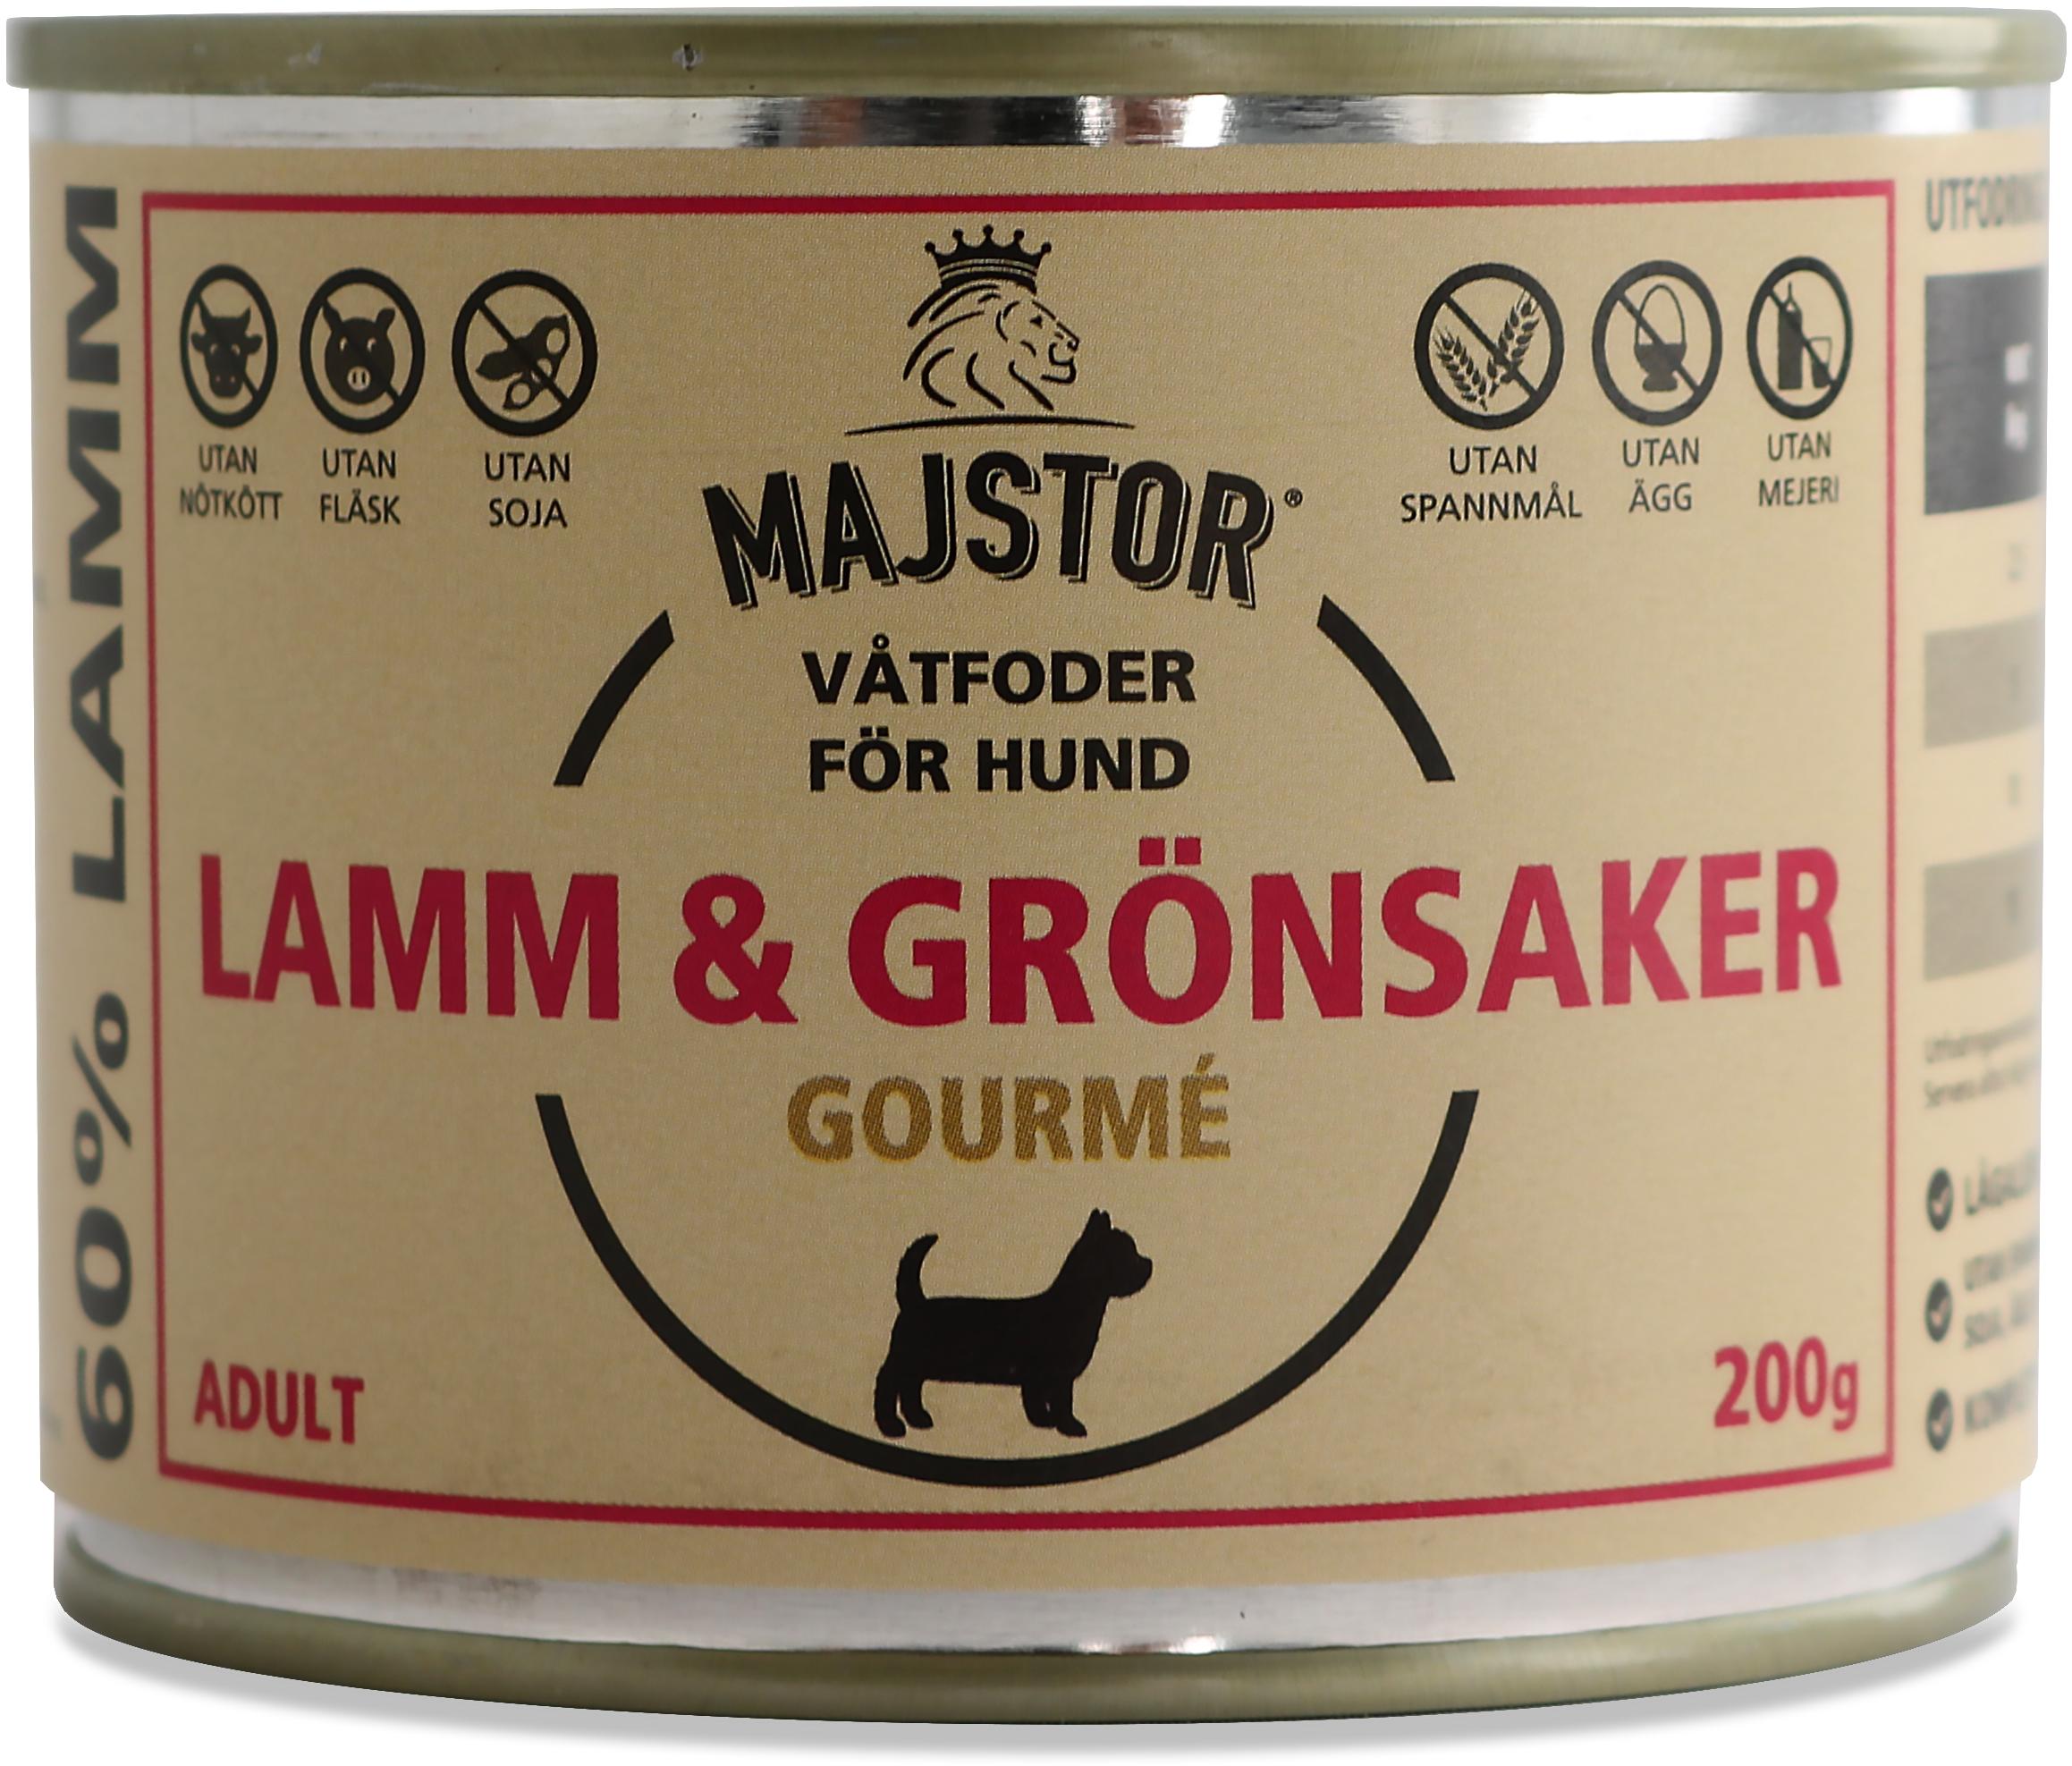 Lamm & Grönsaker Gourmè Våtfoder Hund